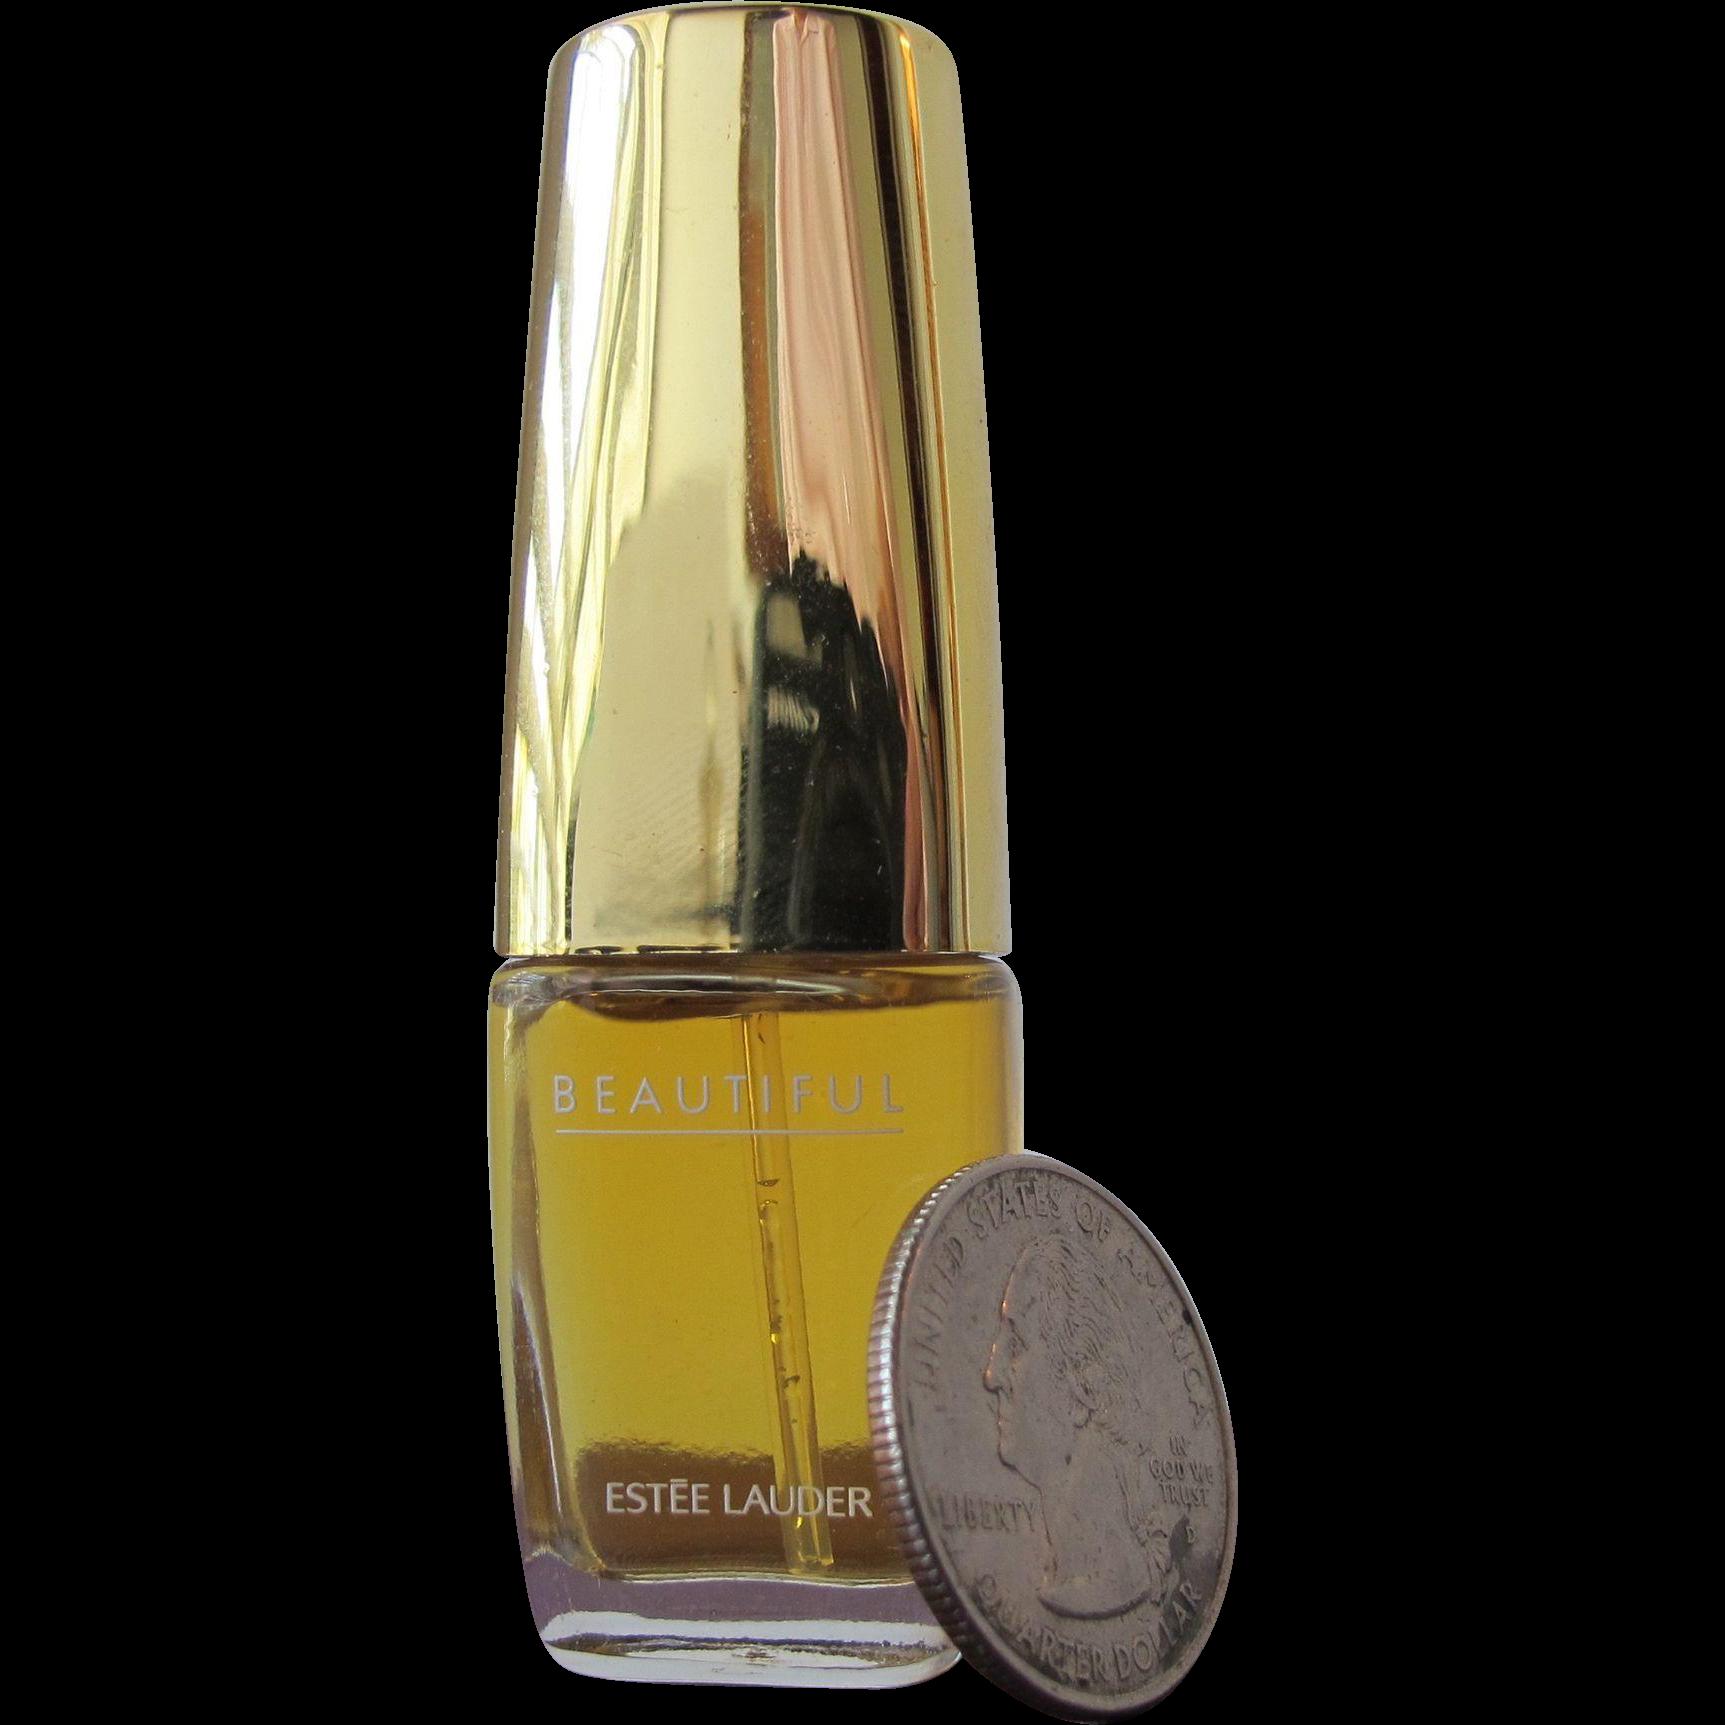 Perfume Bottle by Estee Lauder Purse Spray of Beautiful Parfum